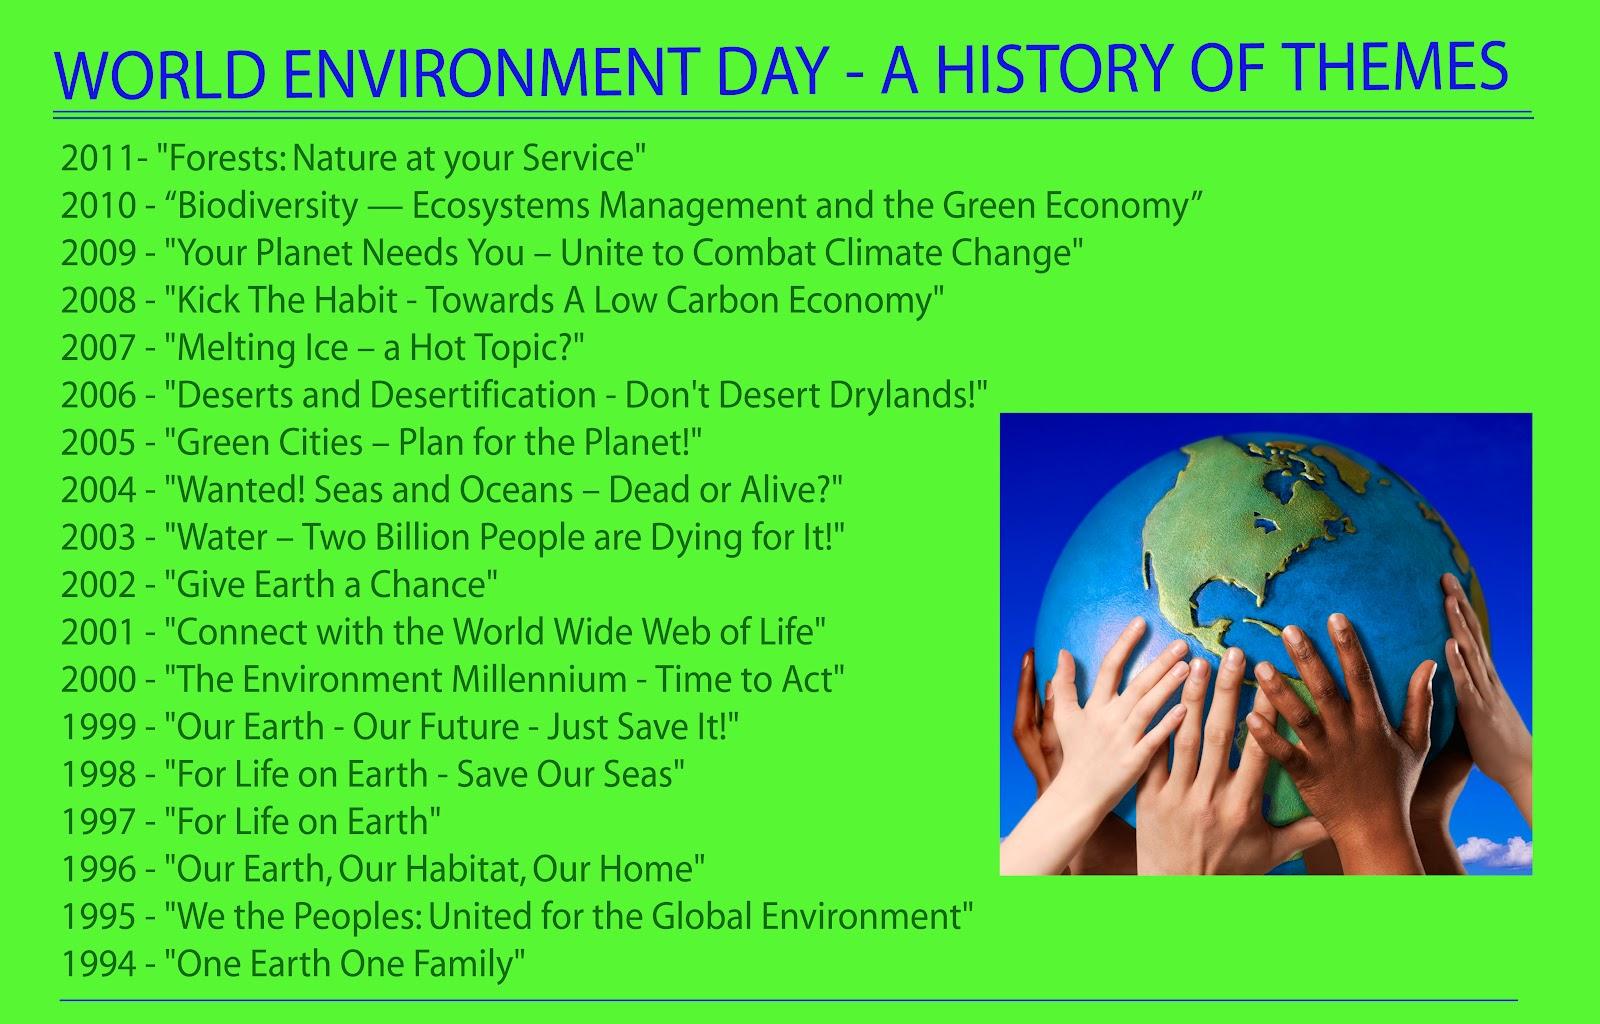 Essay on world environment day 2010